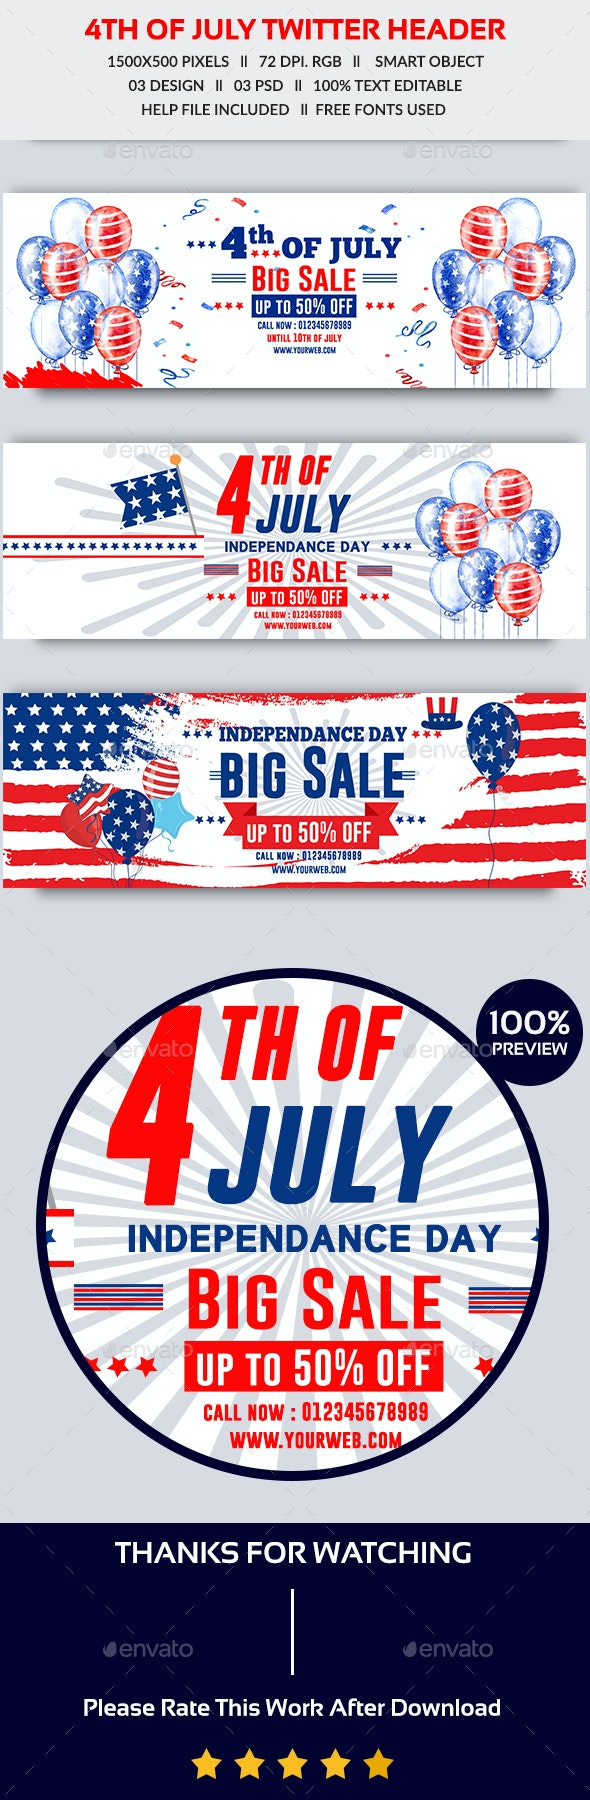 4th of July Sale Twitter Header - Twitter Social Media